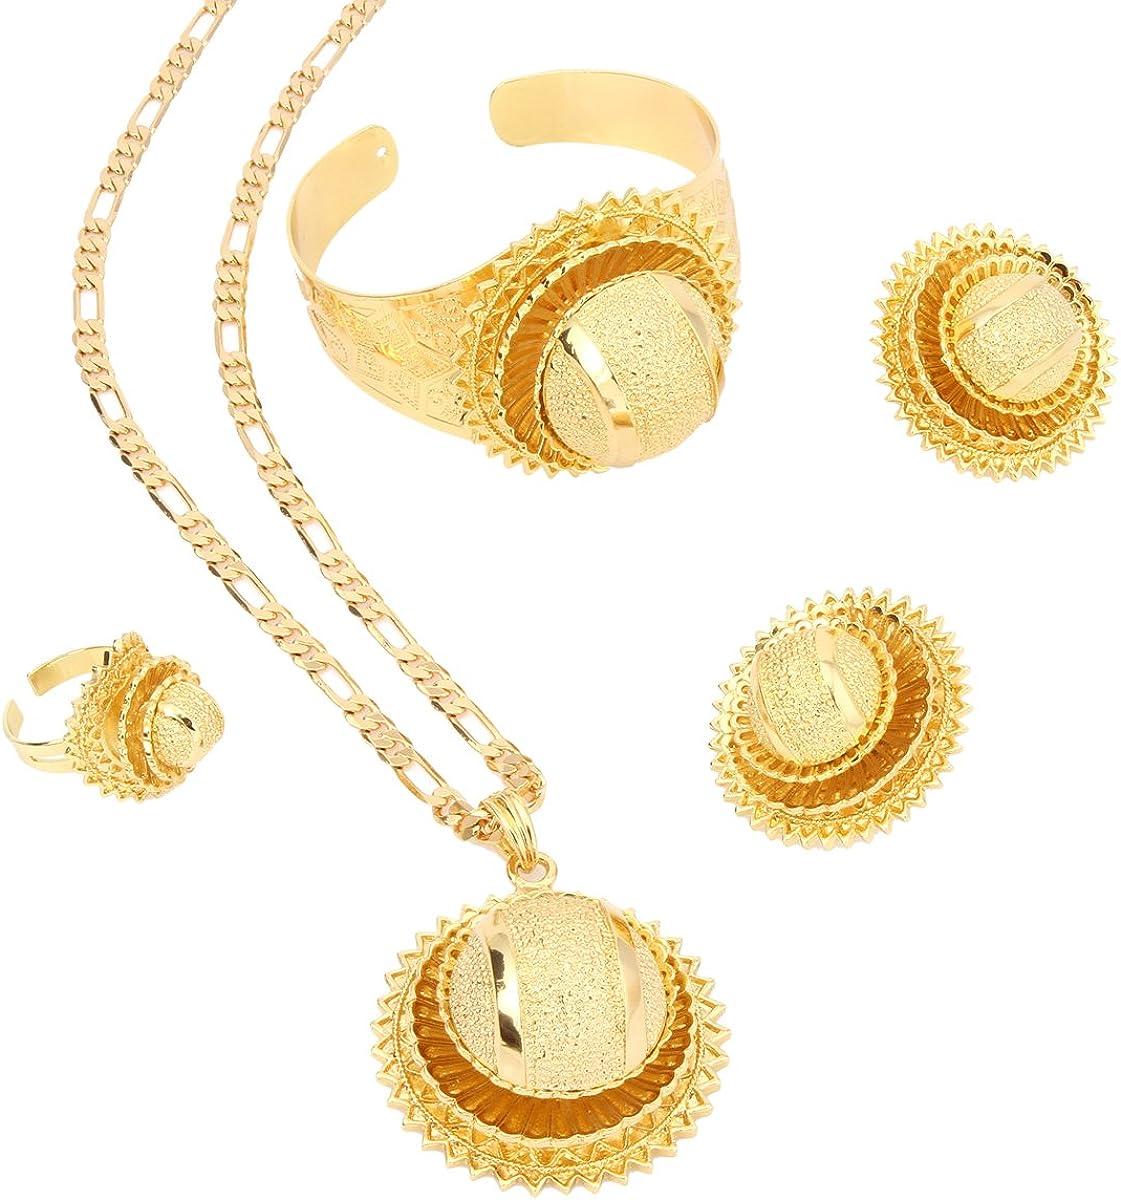 New Ethiopian 24K Gold Set Jewelry Pendant Chain Clip Earring Ring Bangle Set